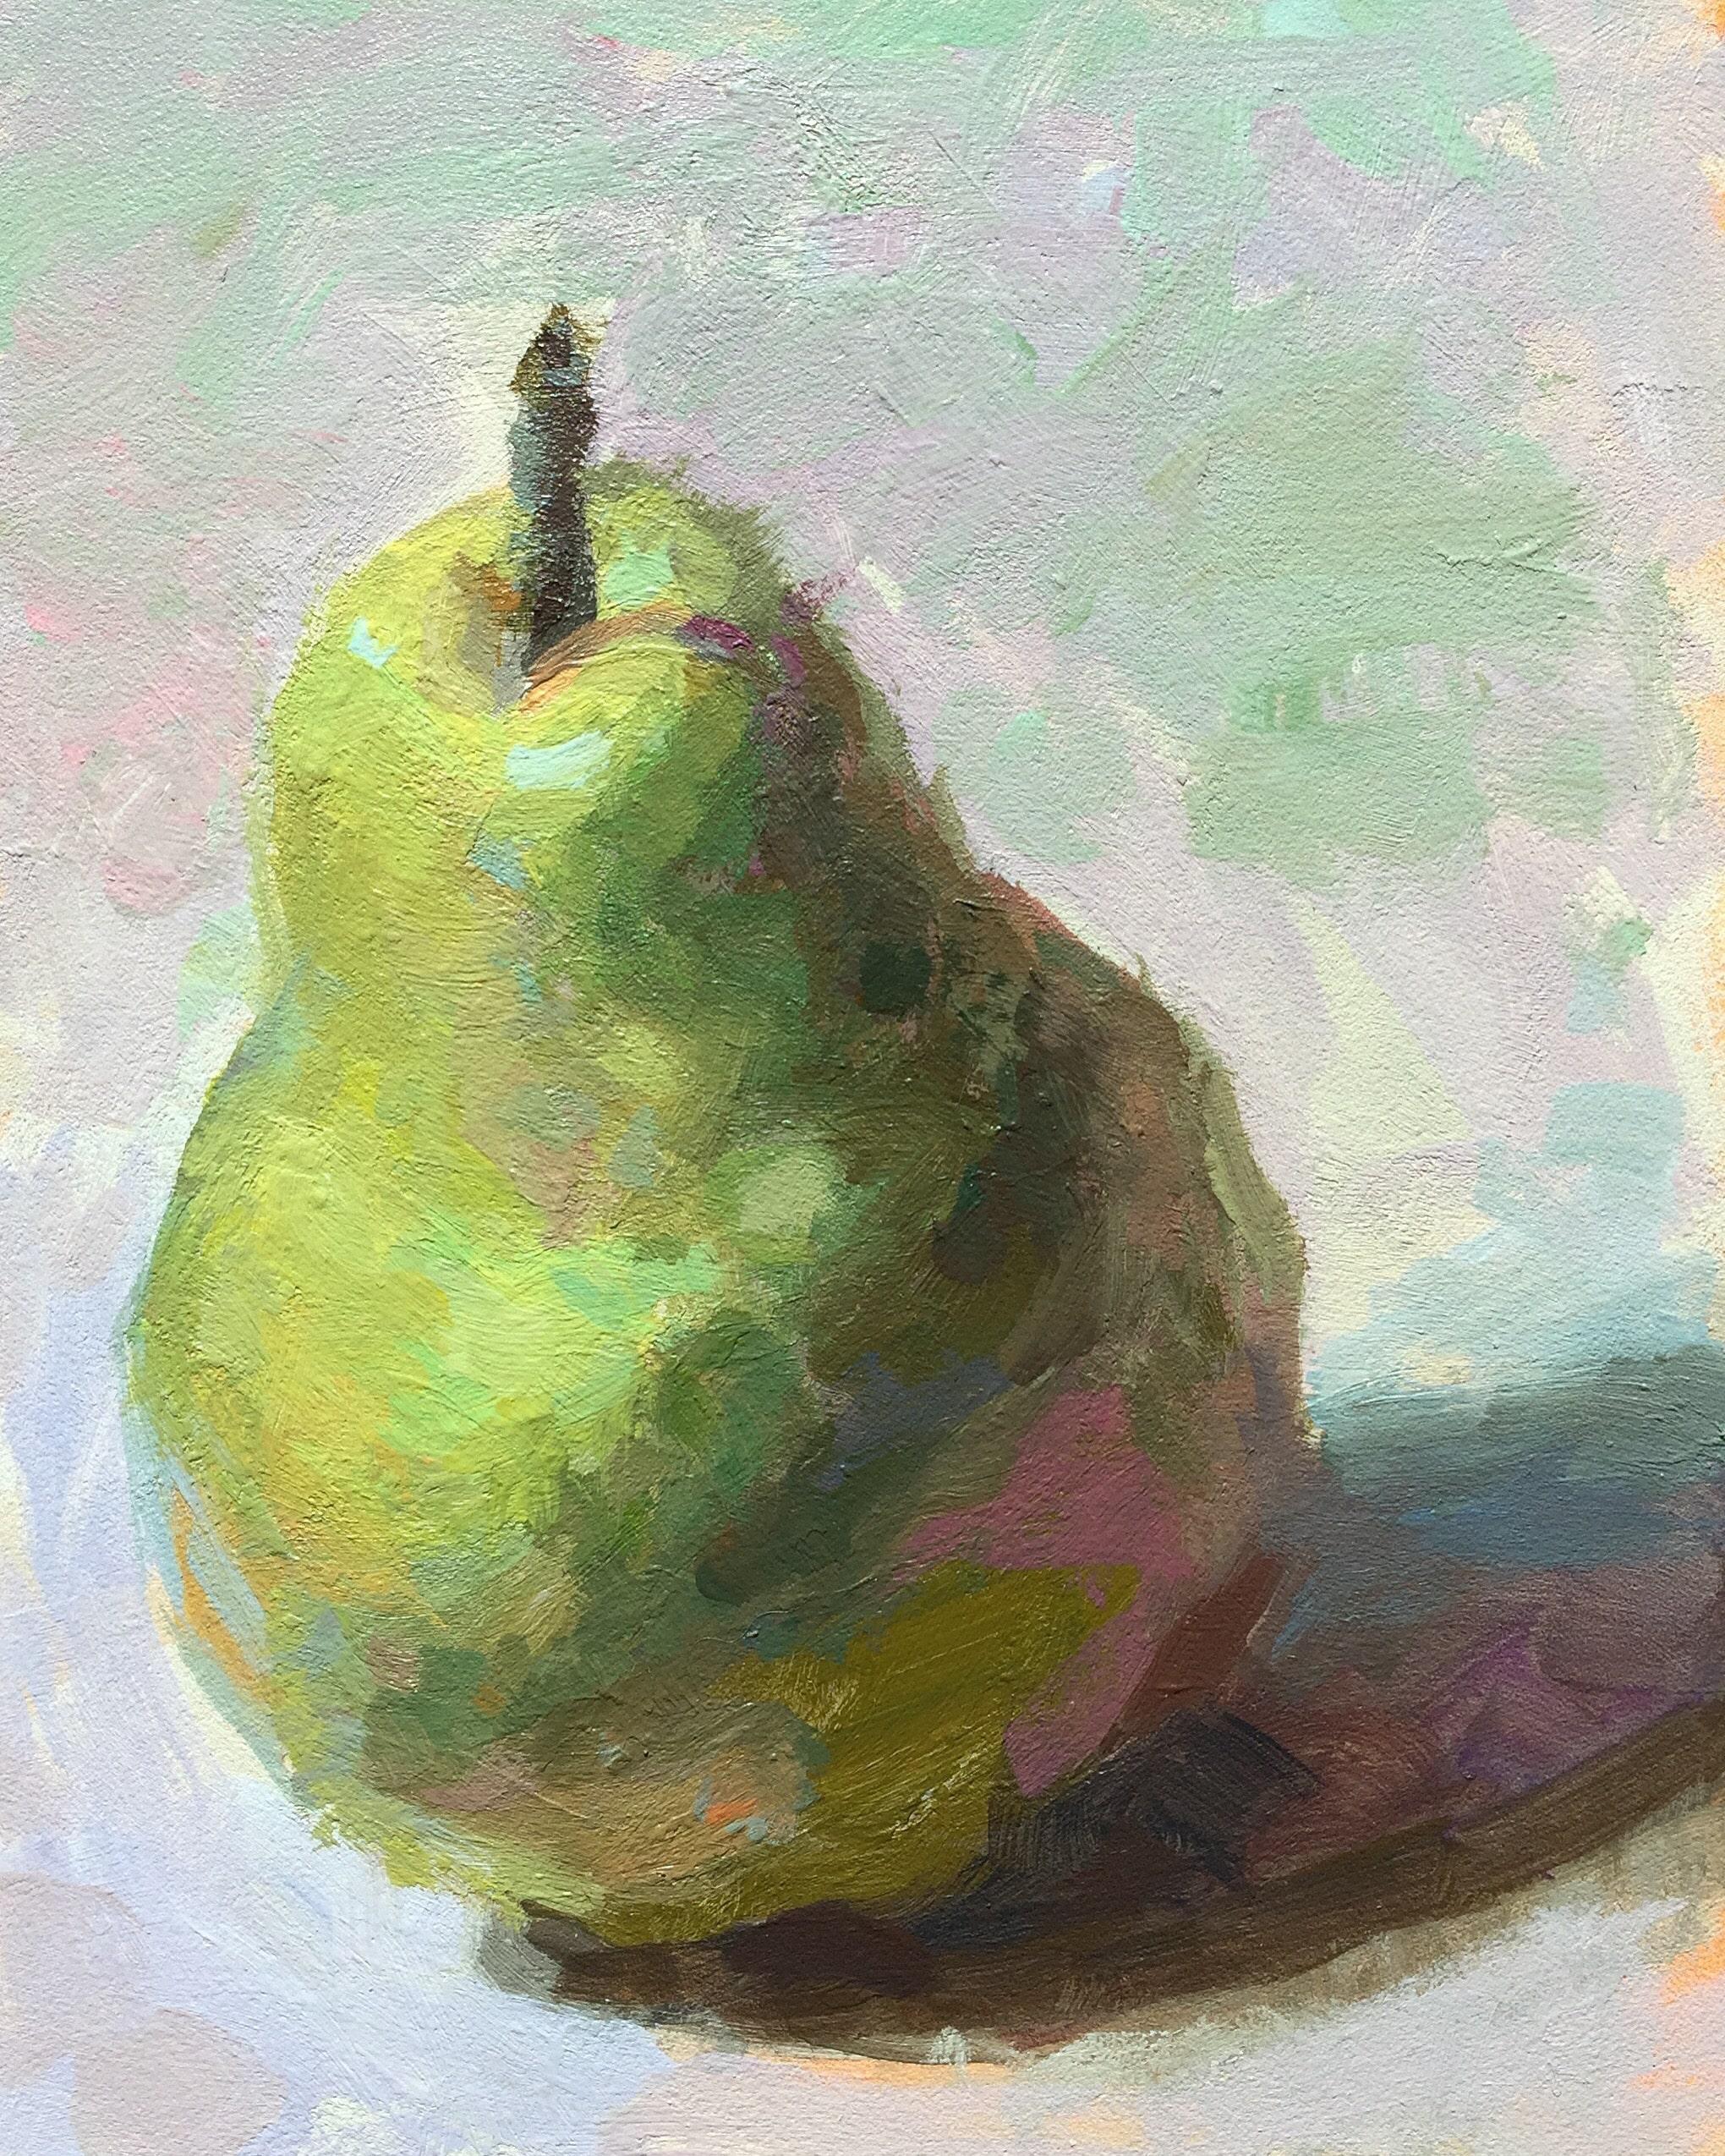 Slightly Off Center | Pear | Jeffrey Smith